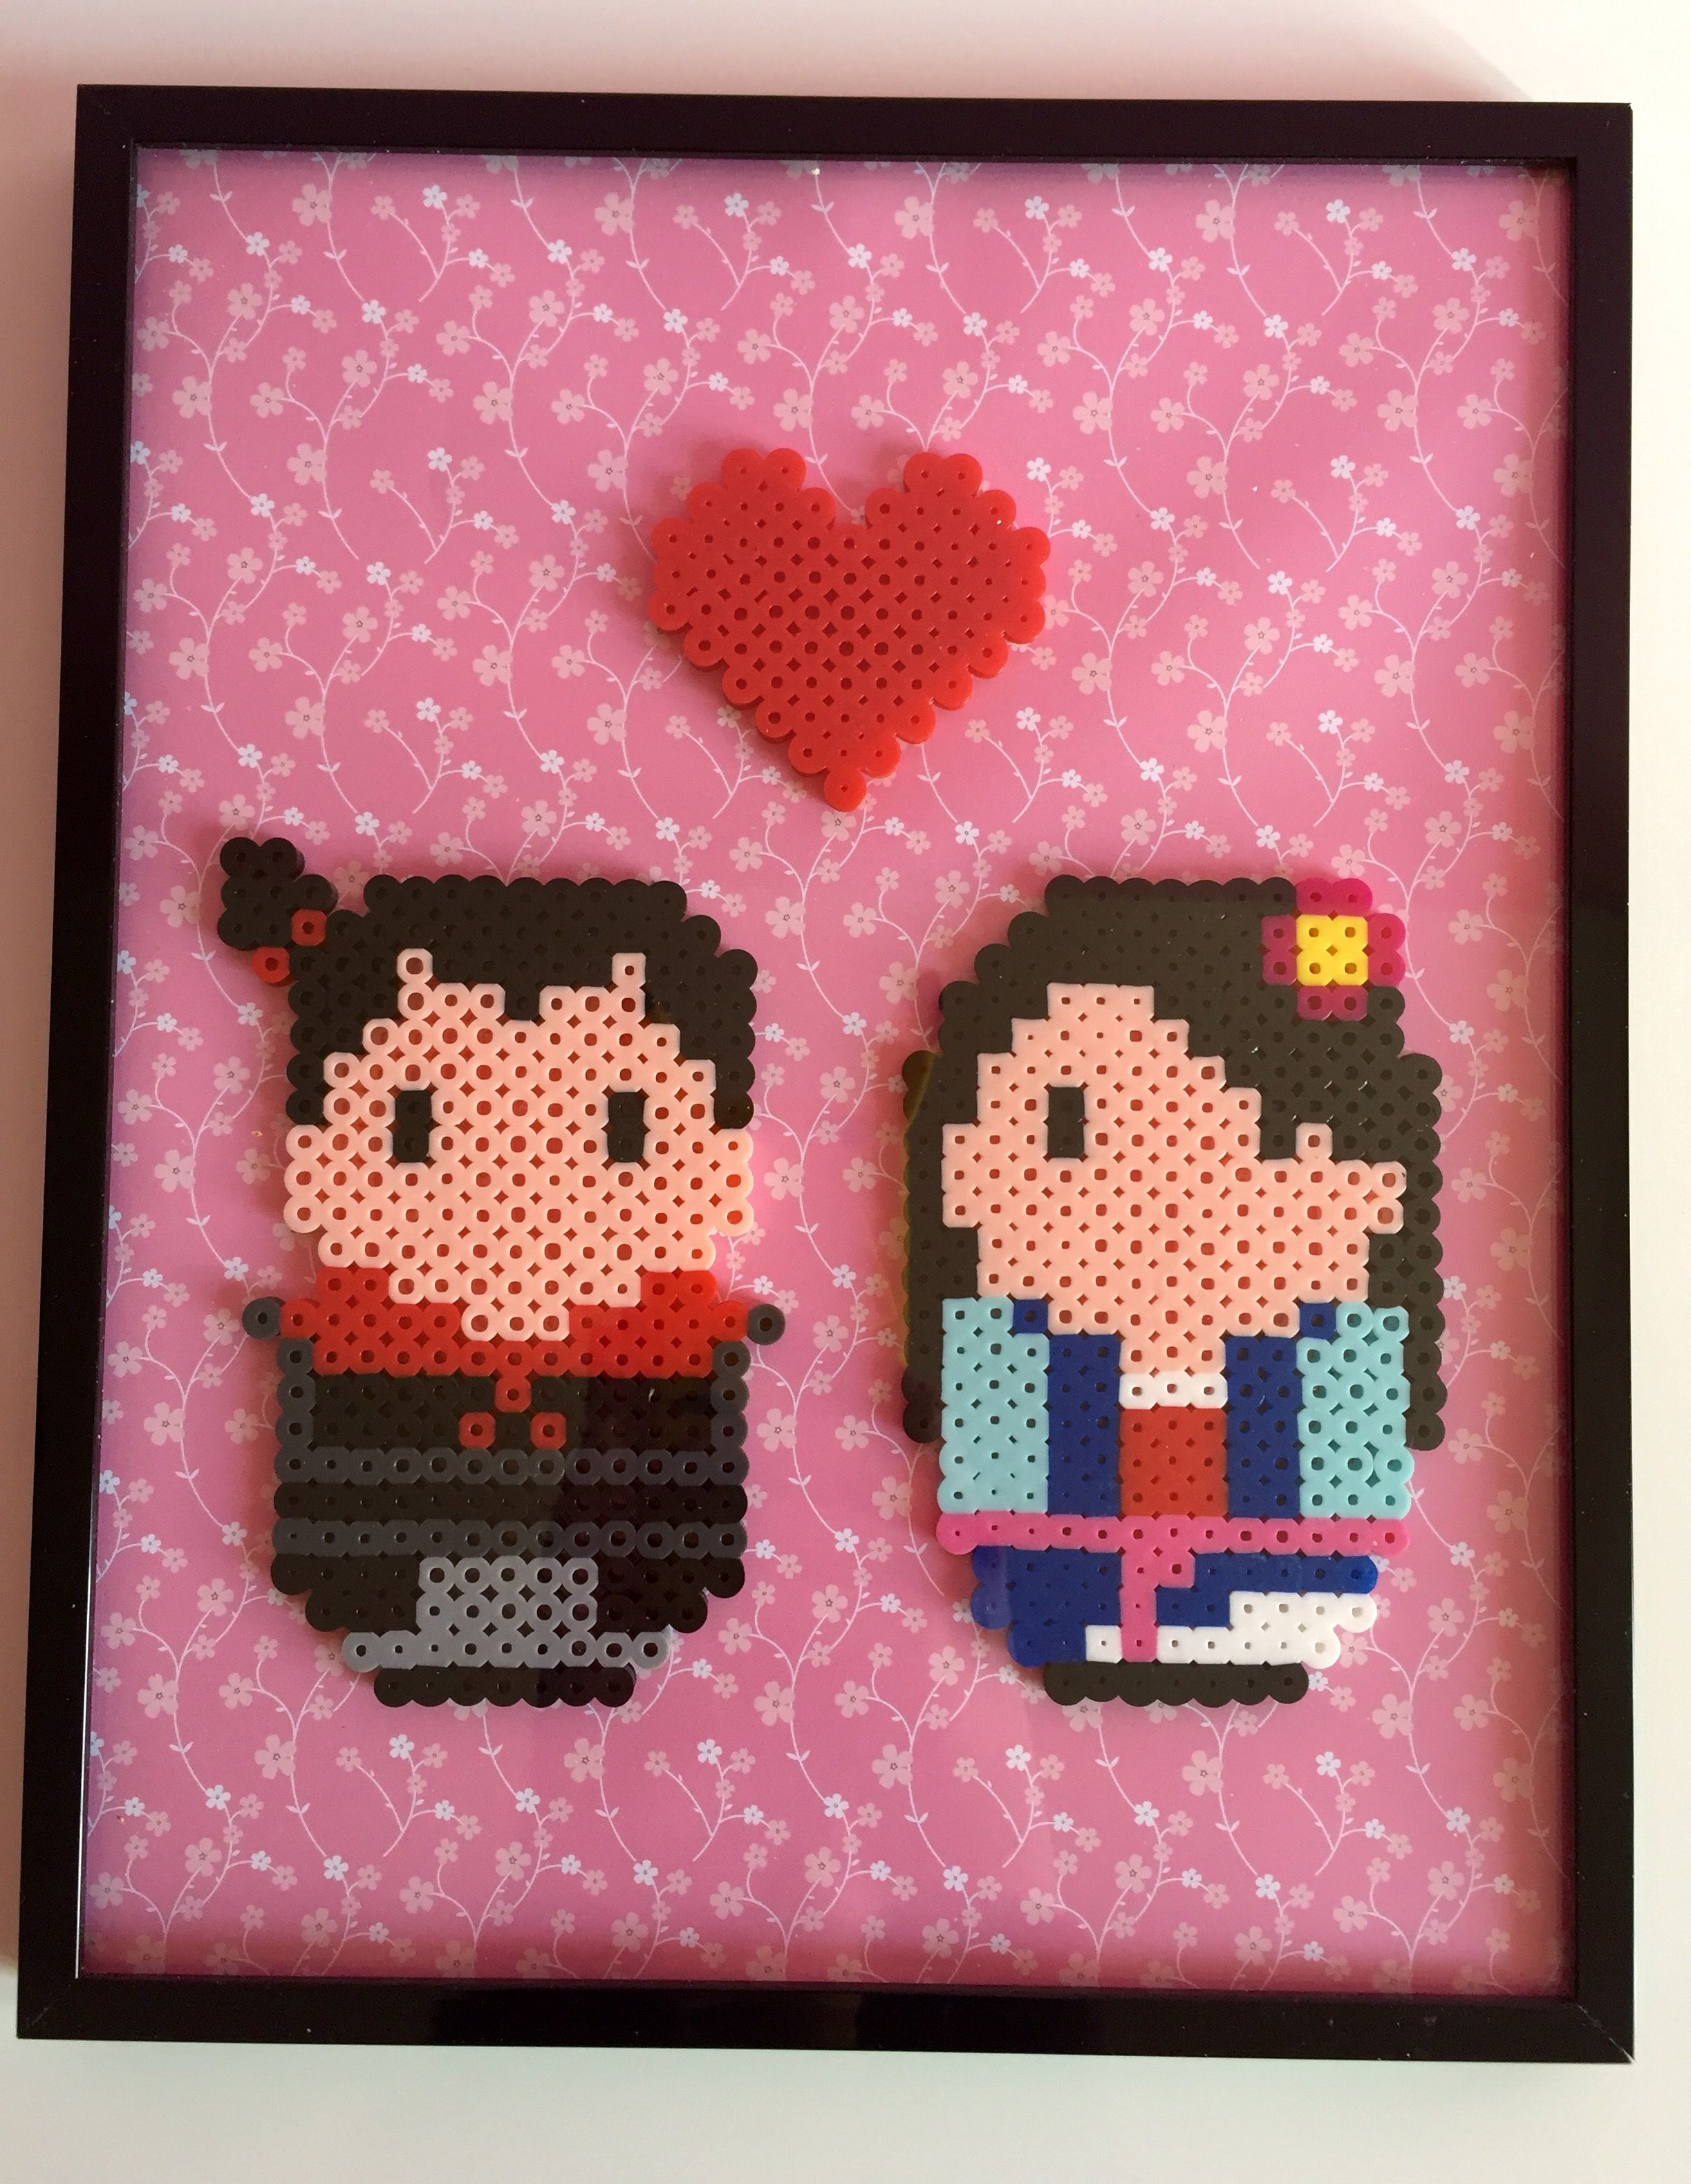 Framed Mulan and Shang Couple Perler Wall Art by Pixel